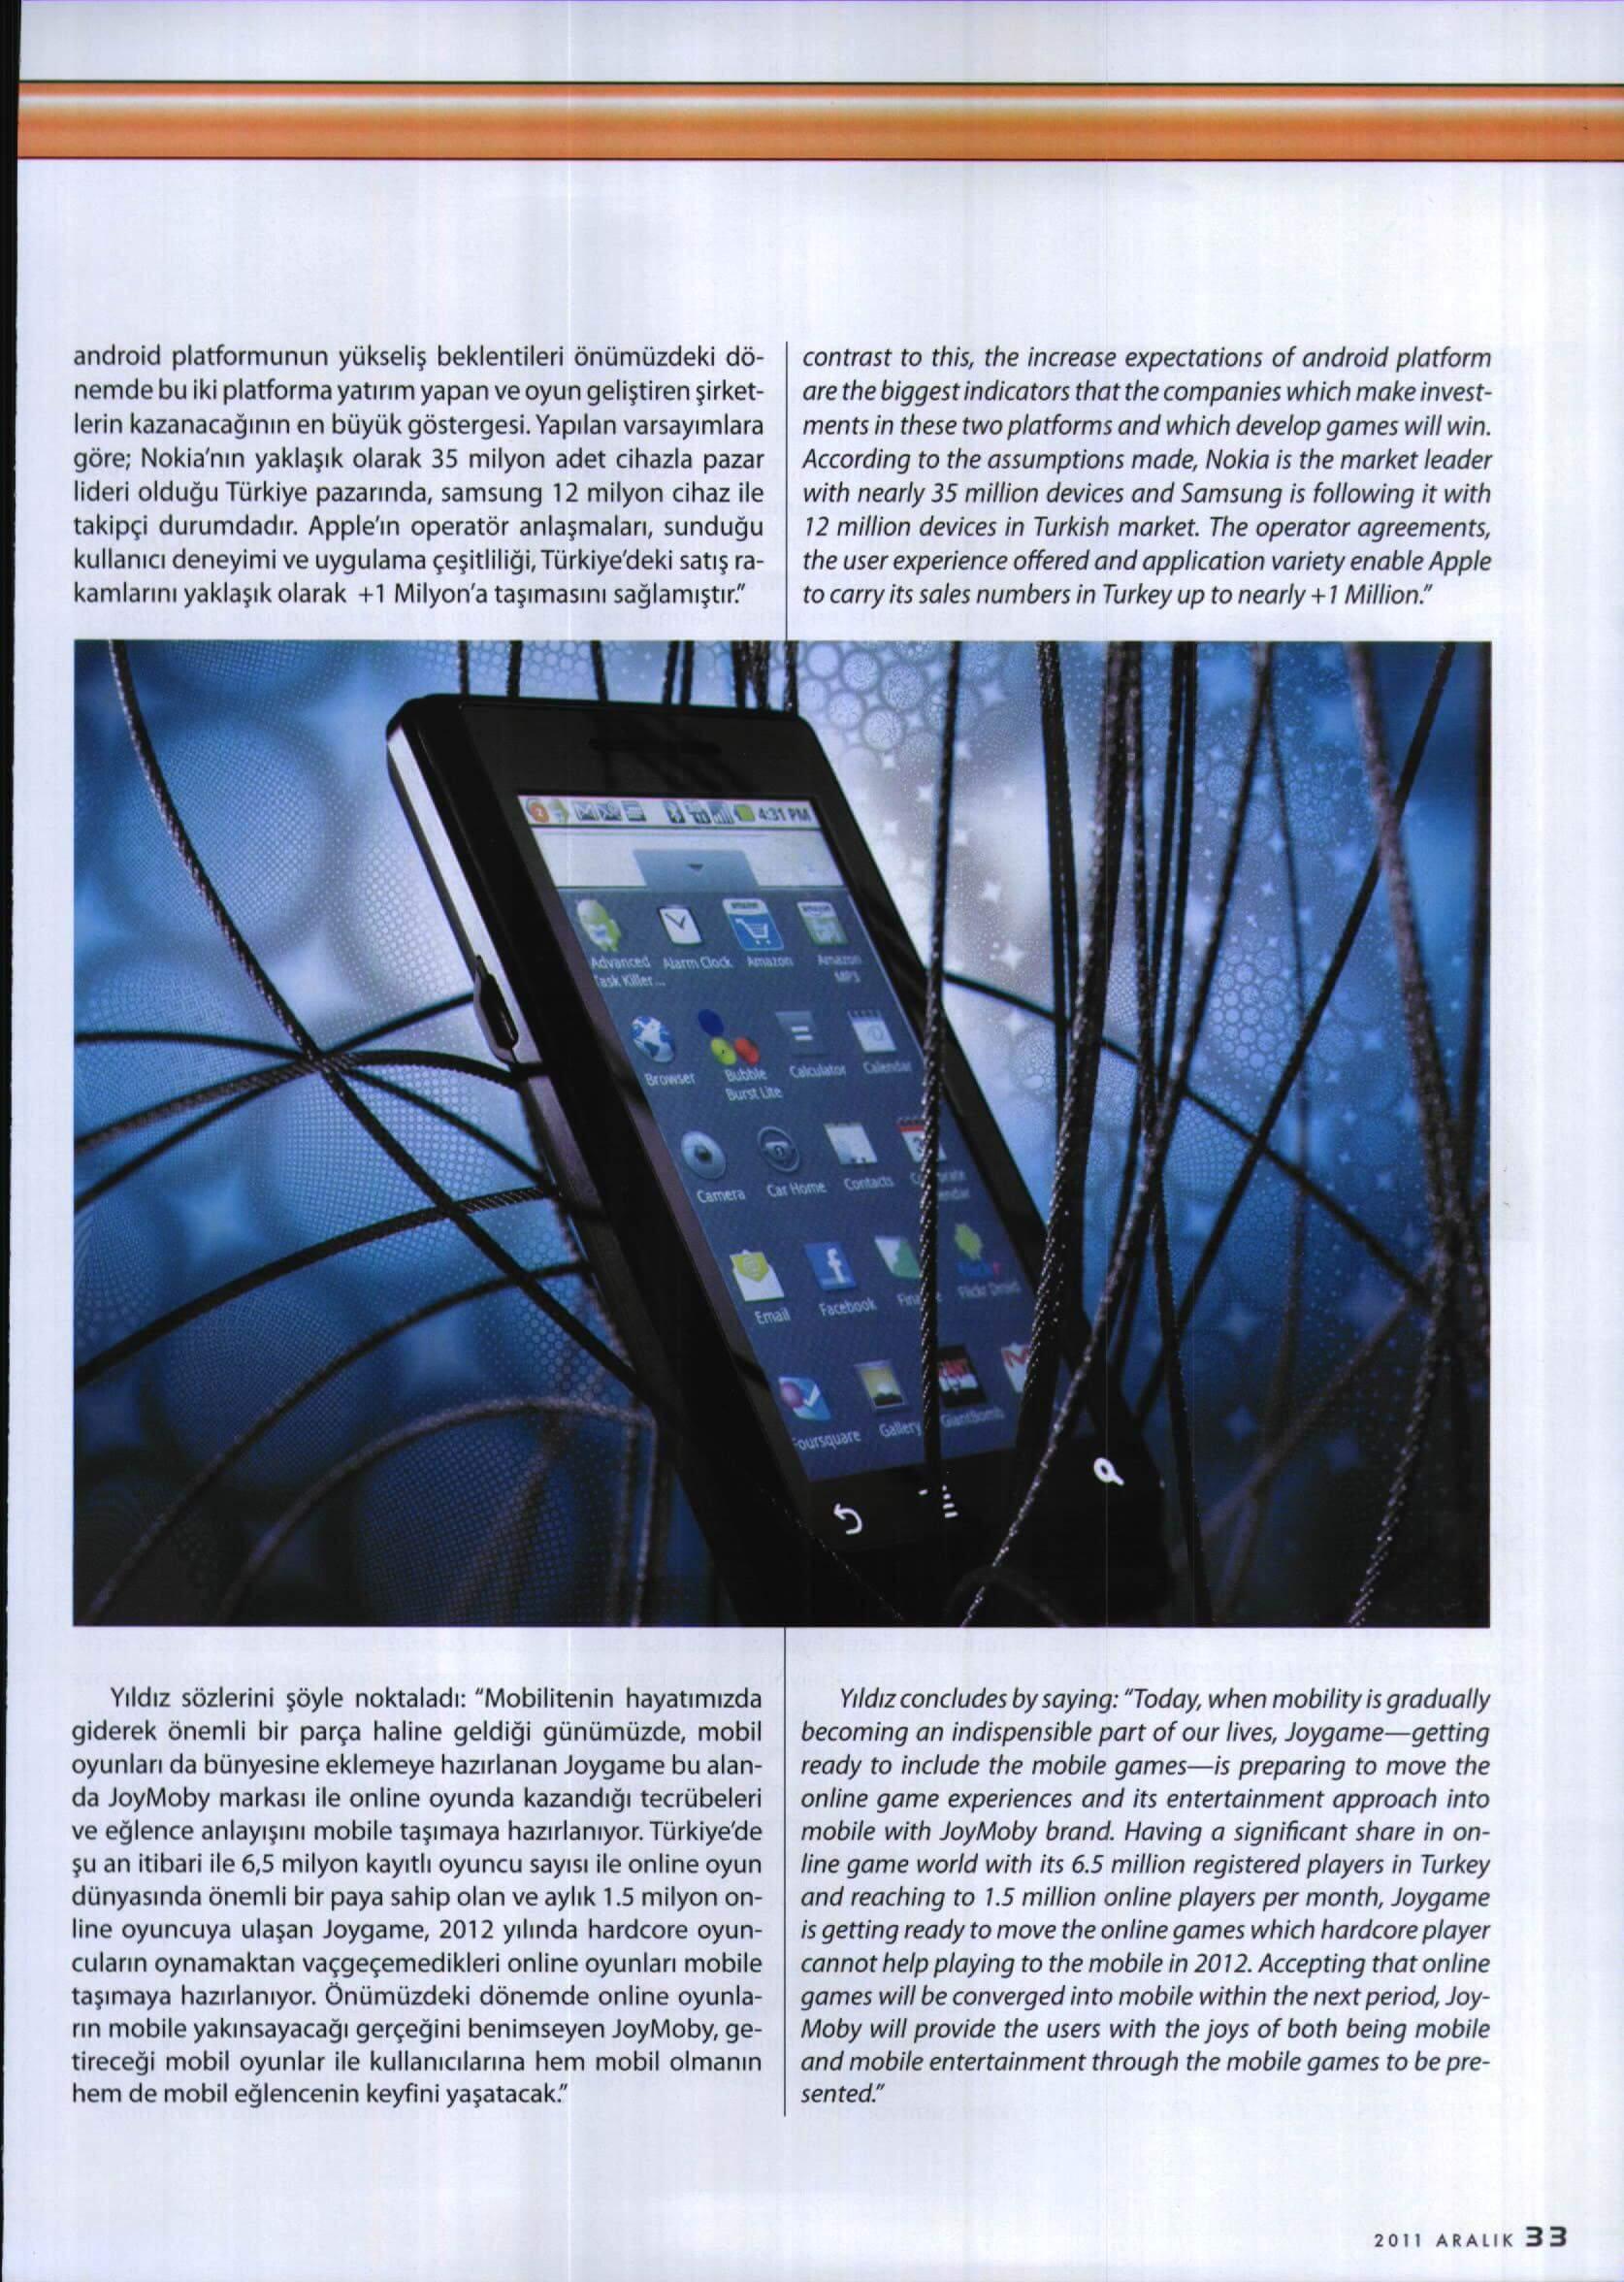 joygame basin yansimalari ict media dergisi aralik